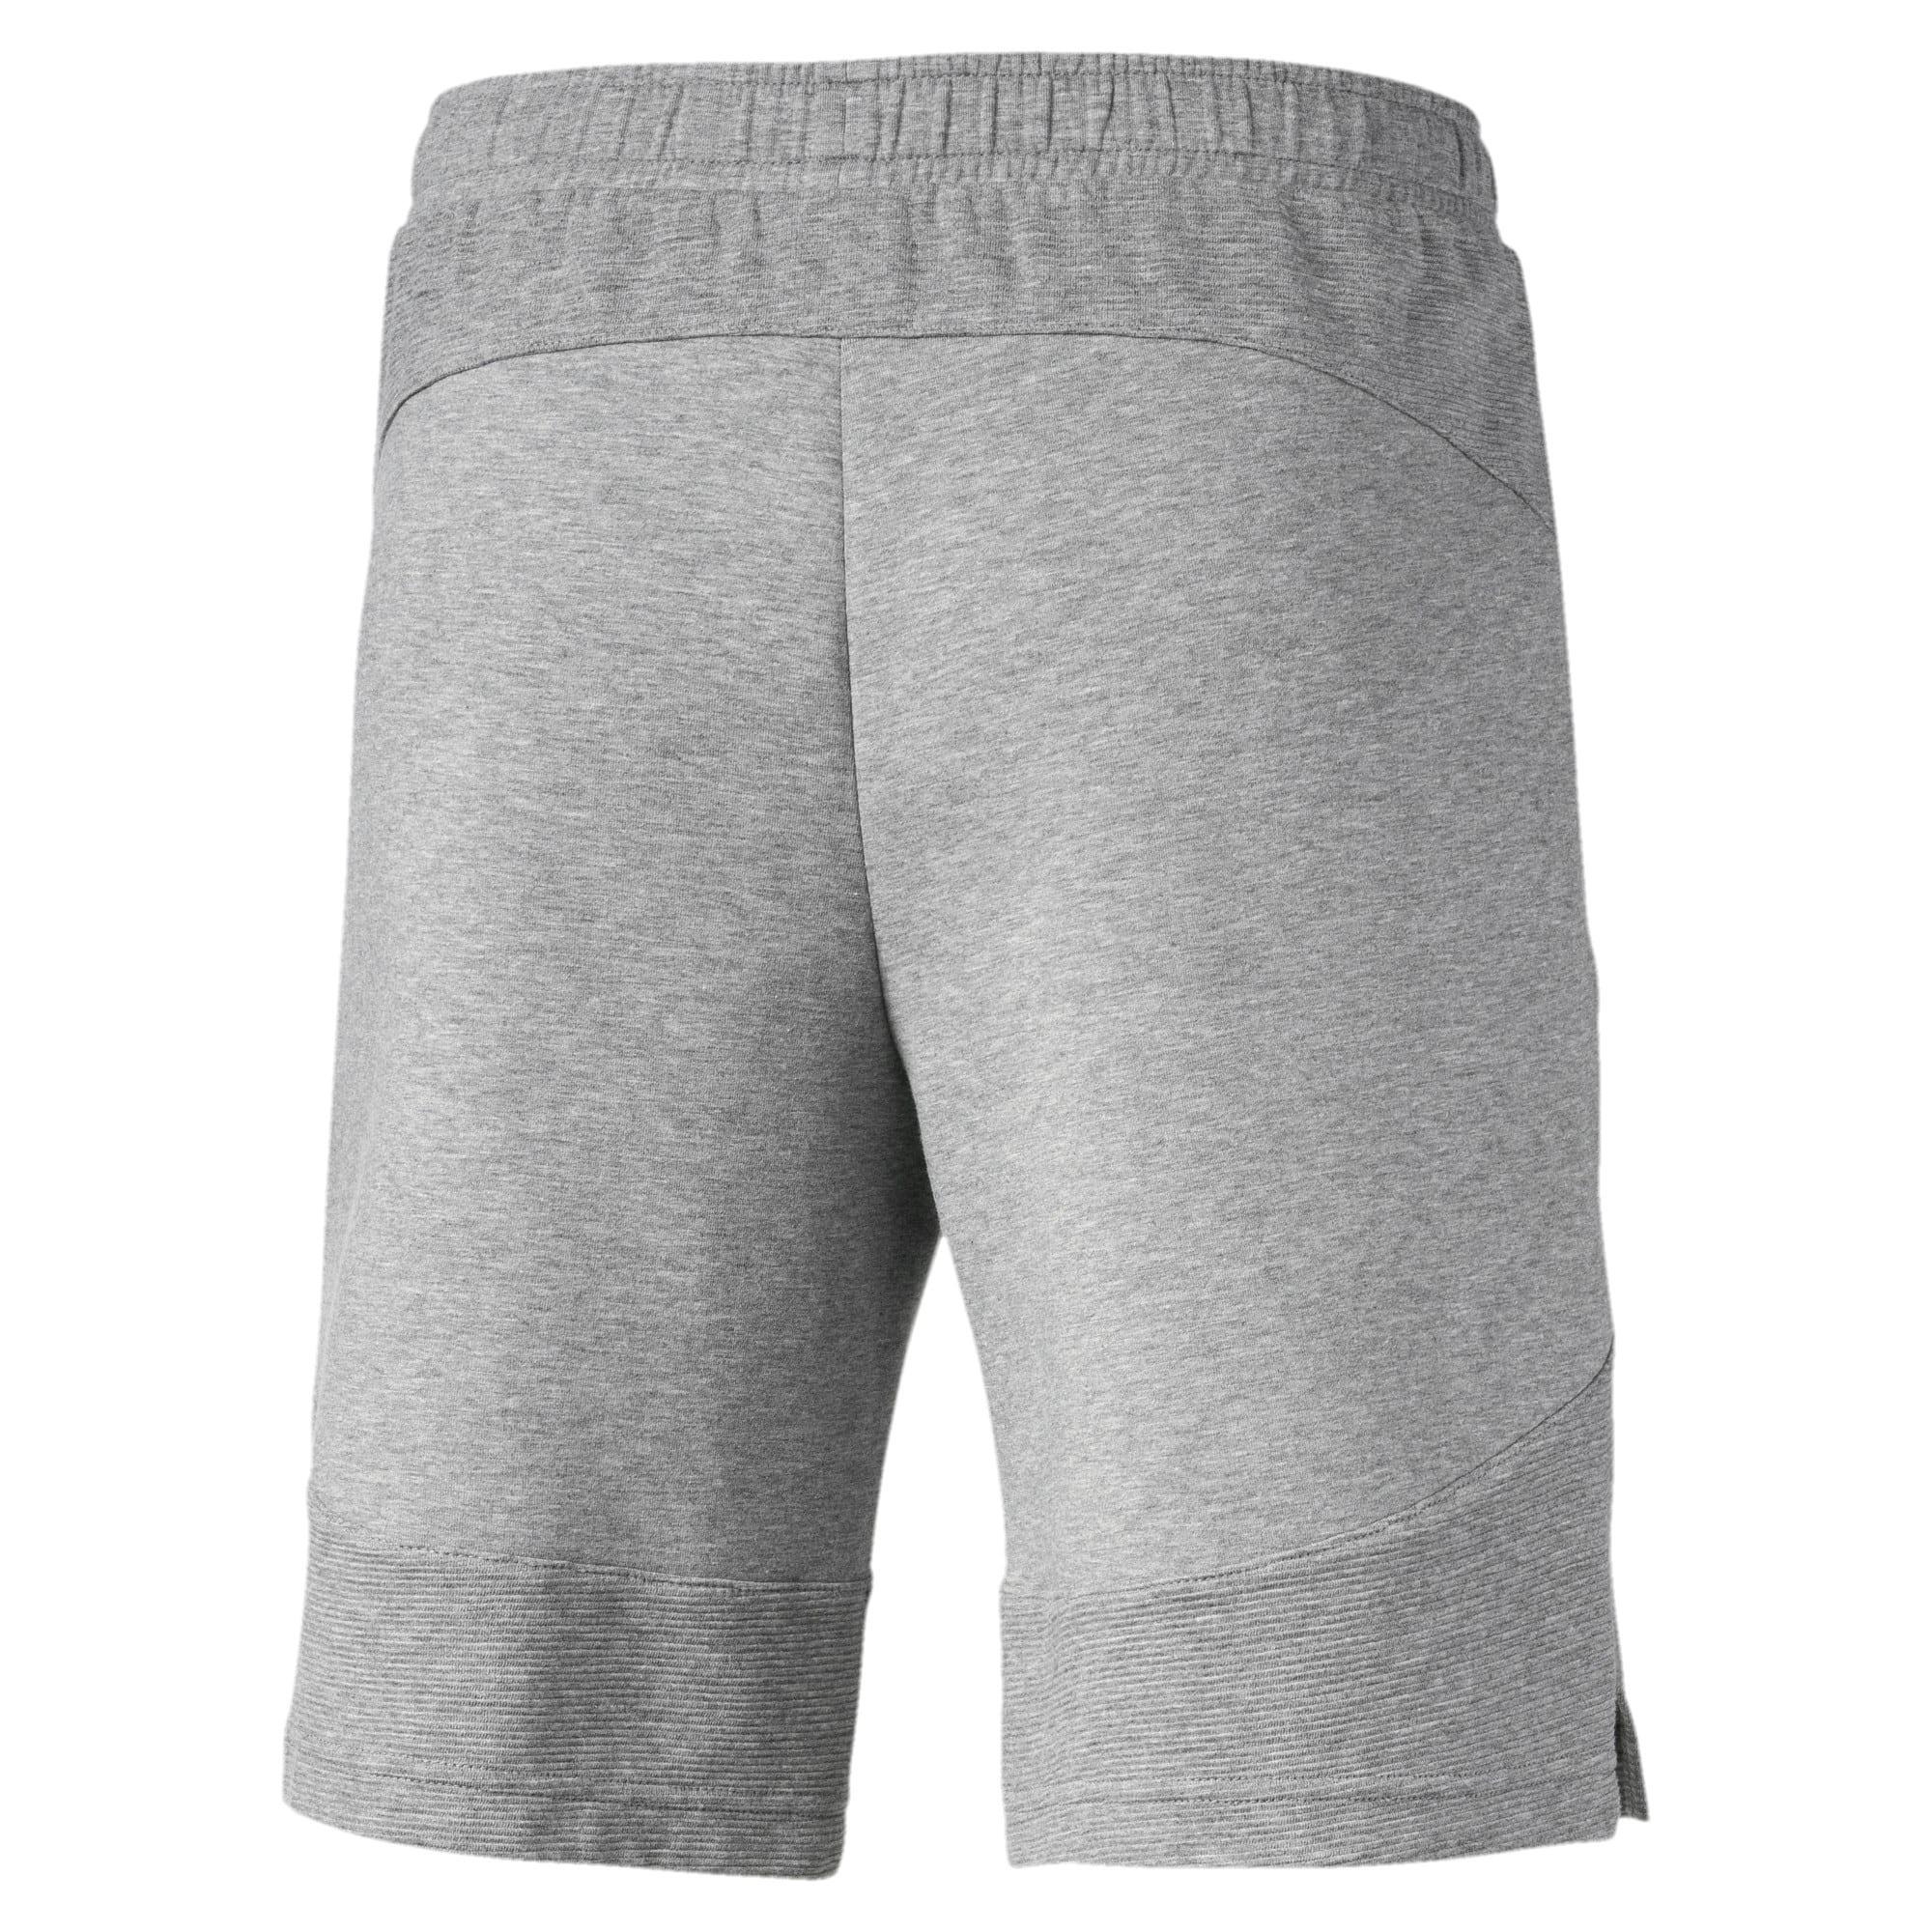 Thumbnail 5 of Evostripe Men's Shorts, Medium Gray Heather, medium